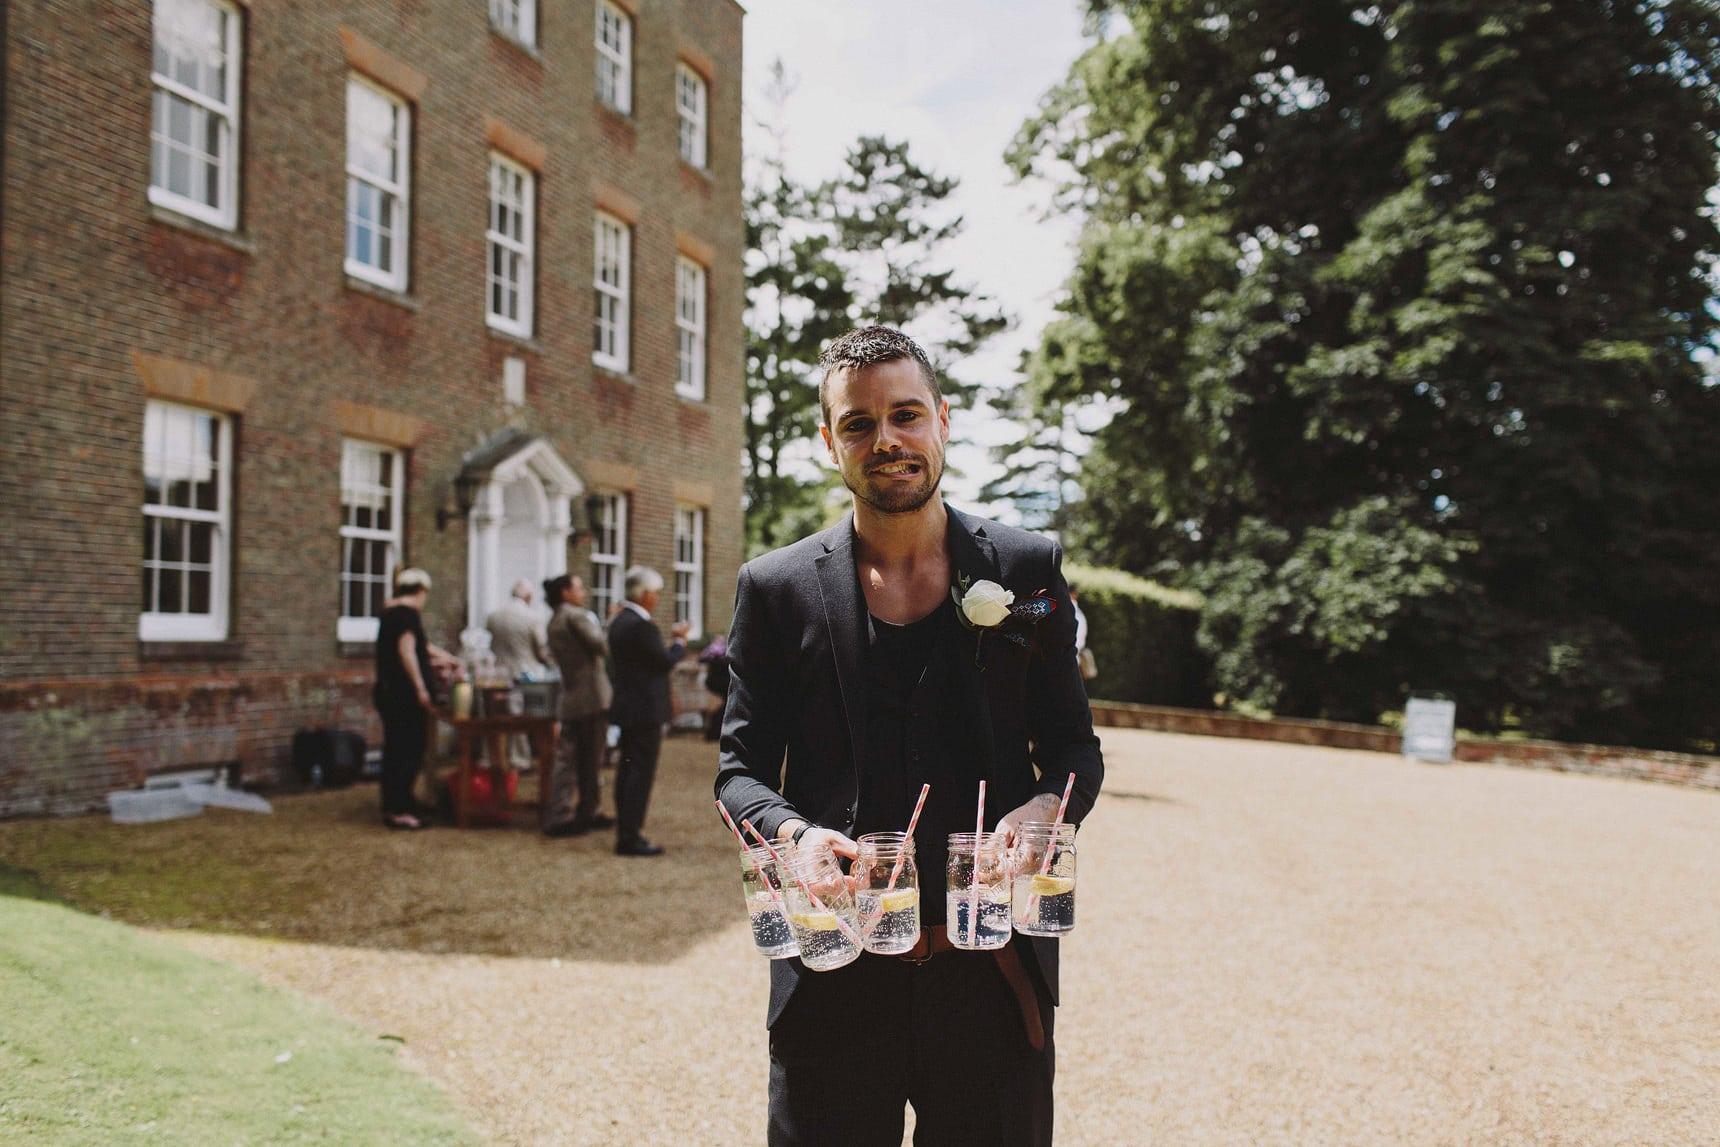 swarling manor petham wedding